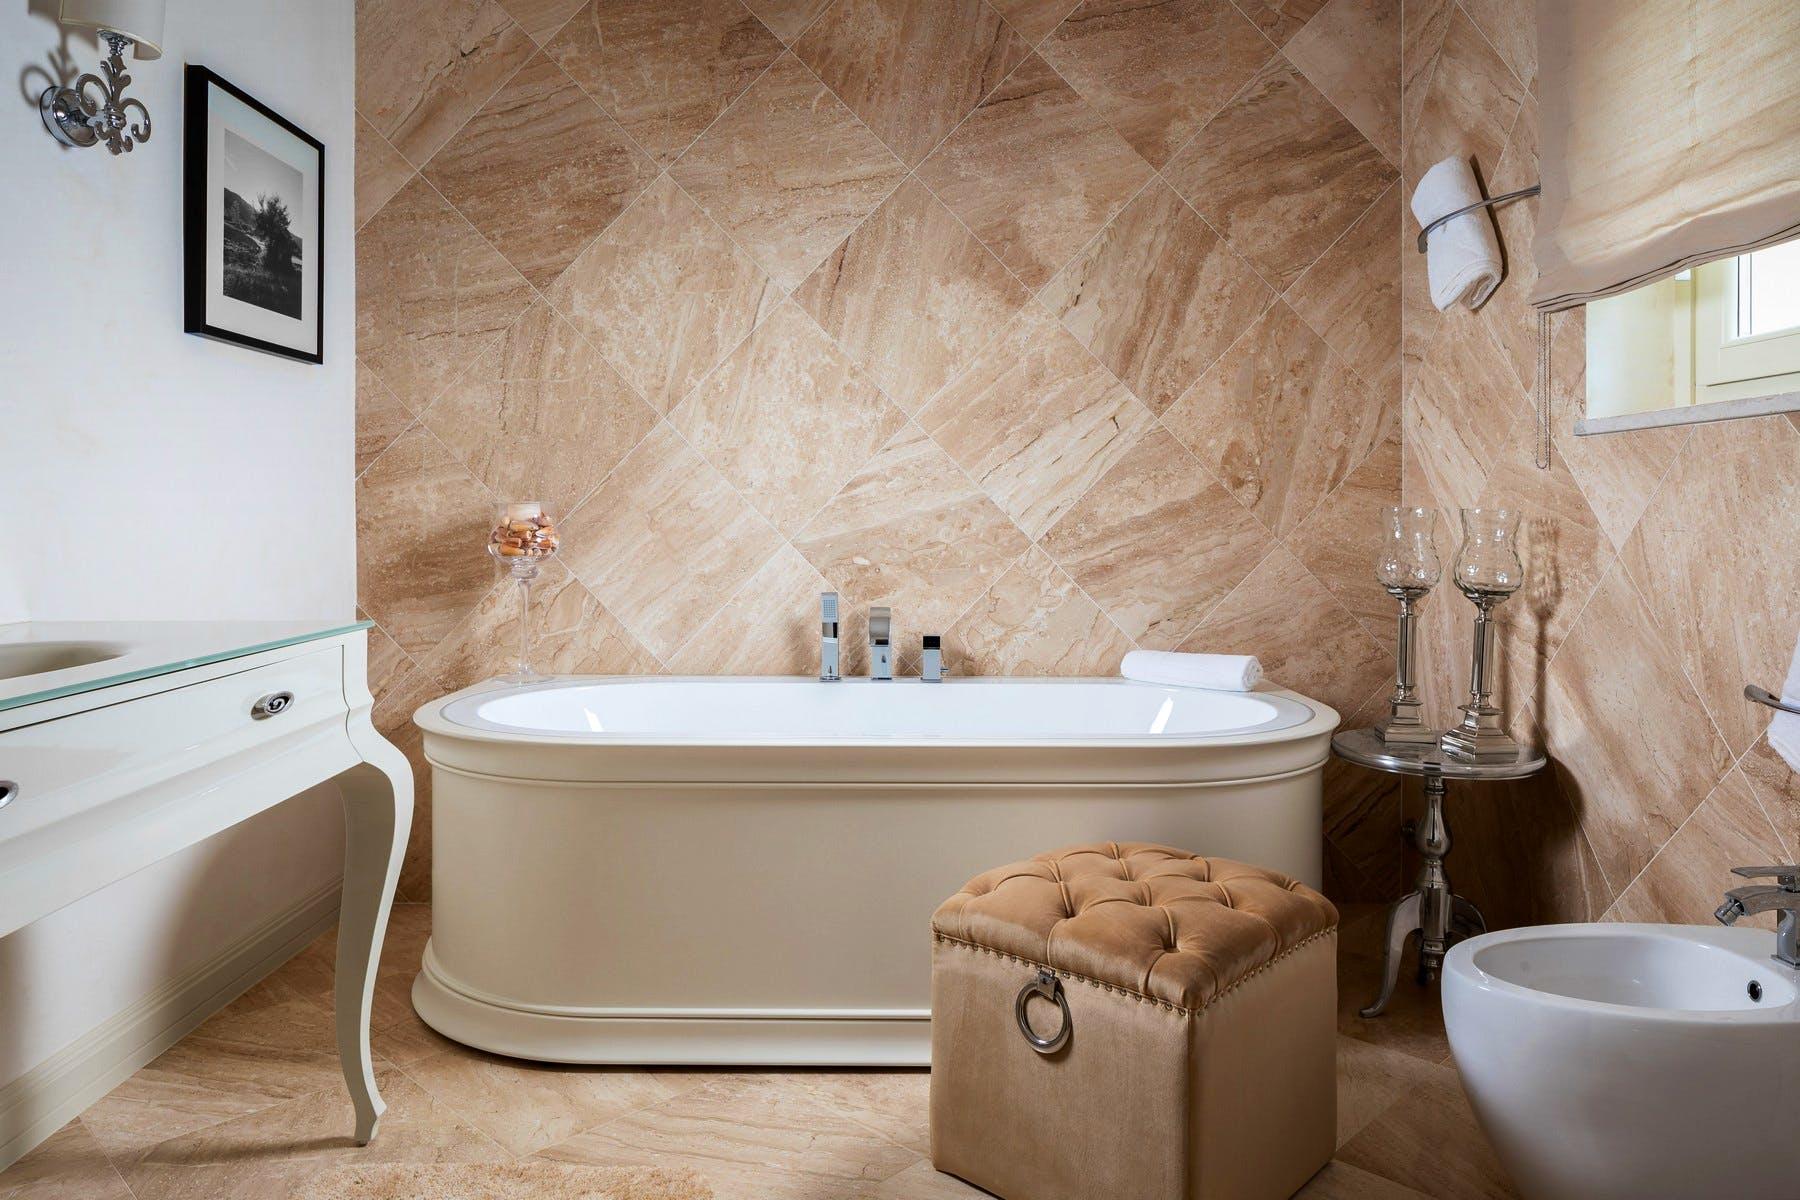 Bathroom area with luxurious amenities